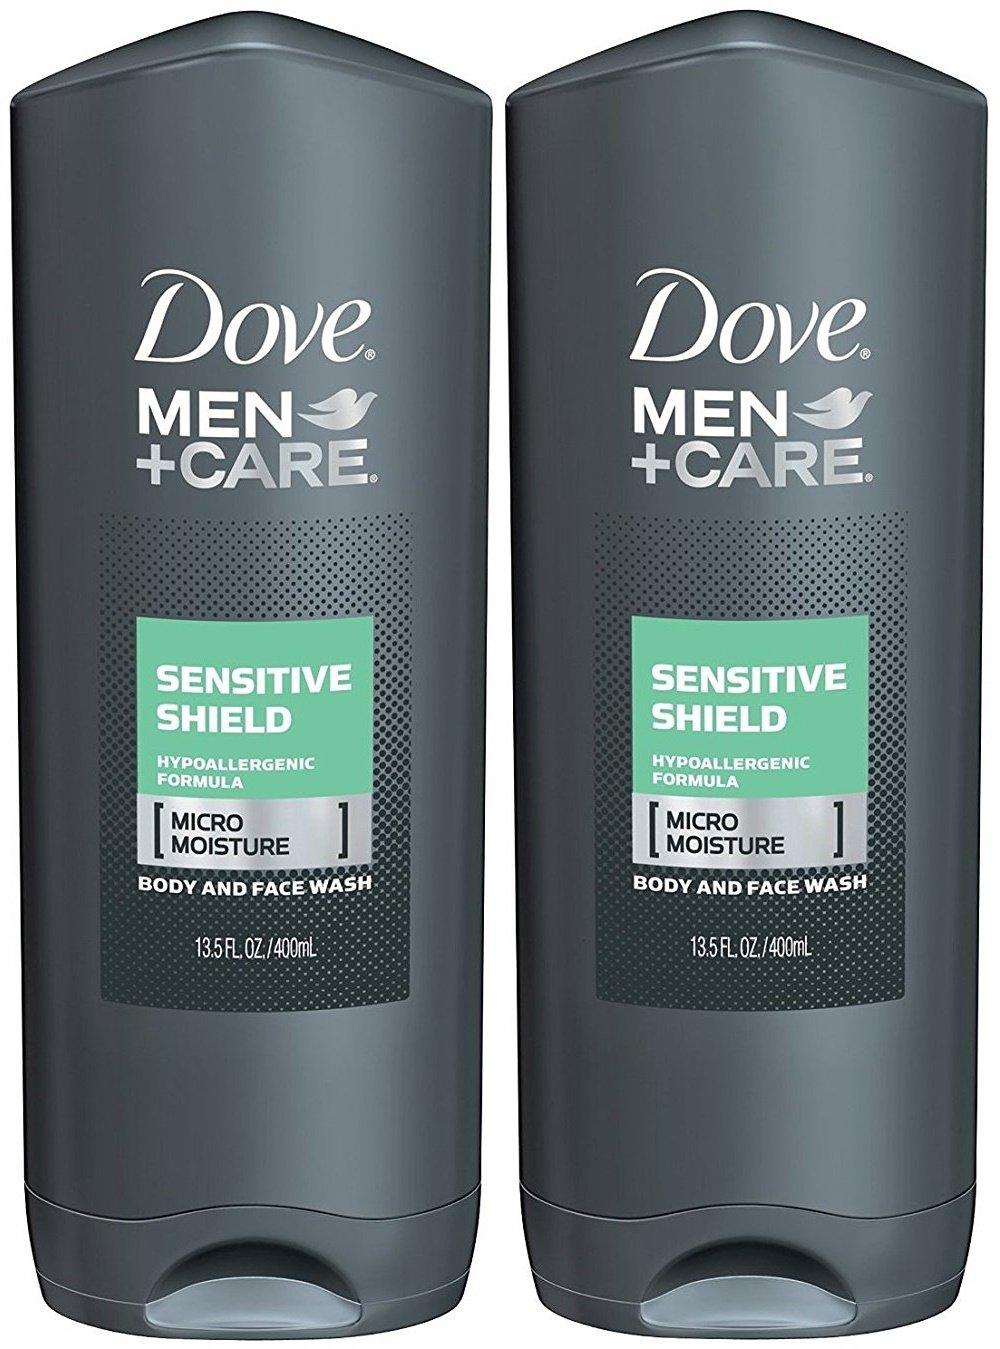 Dove Men+Care Body & Face Wash, Sensitive Shield 13.5 fl oz (pack of 2)